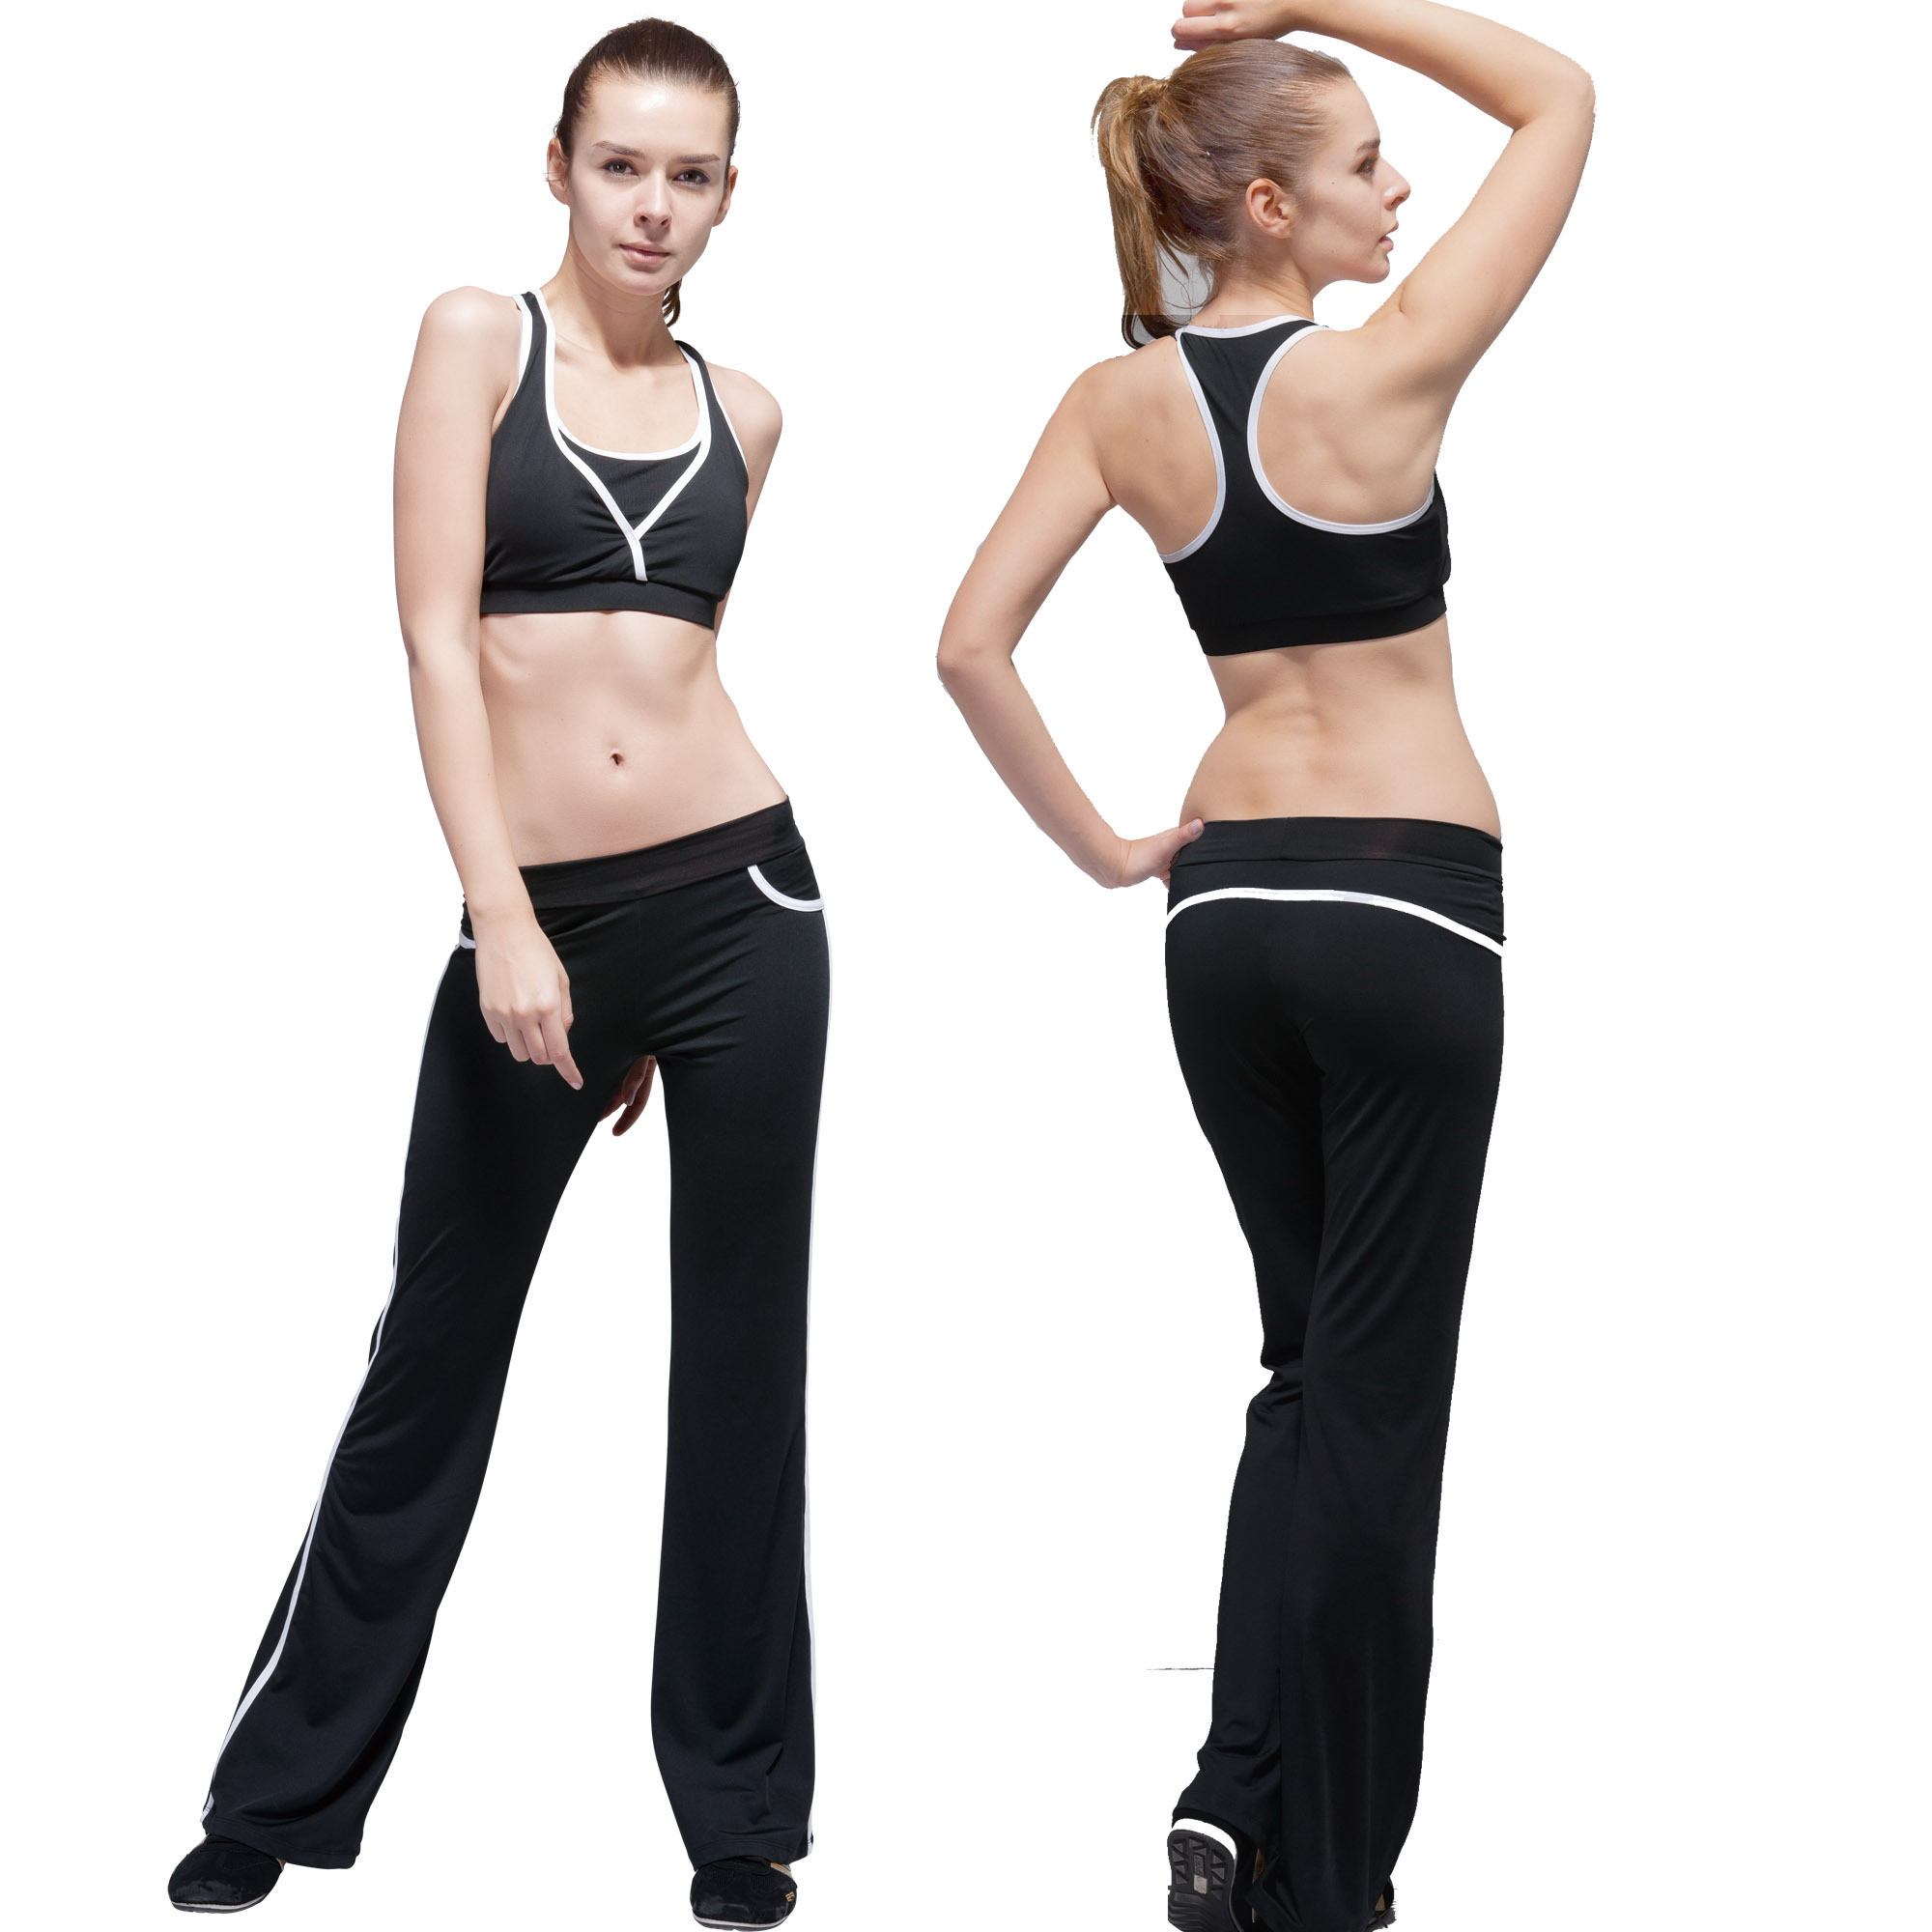 Трико для гимнастики Lefan 21116 2012